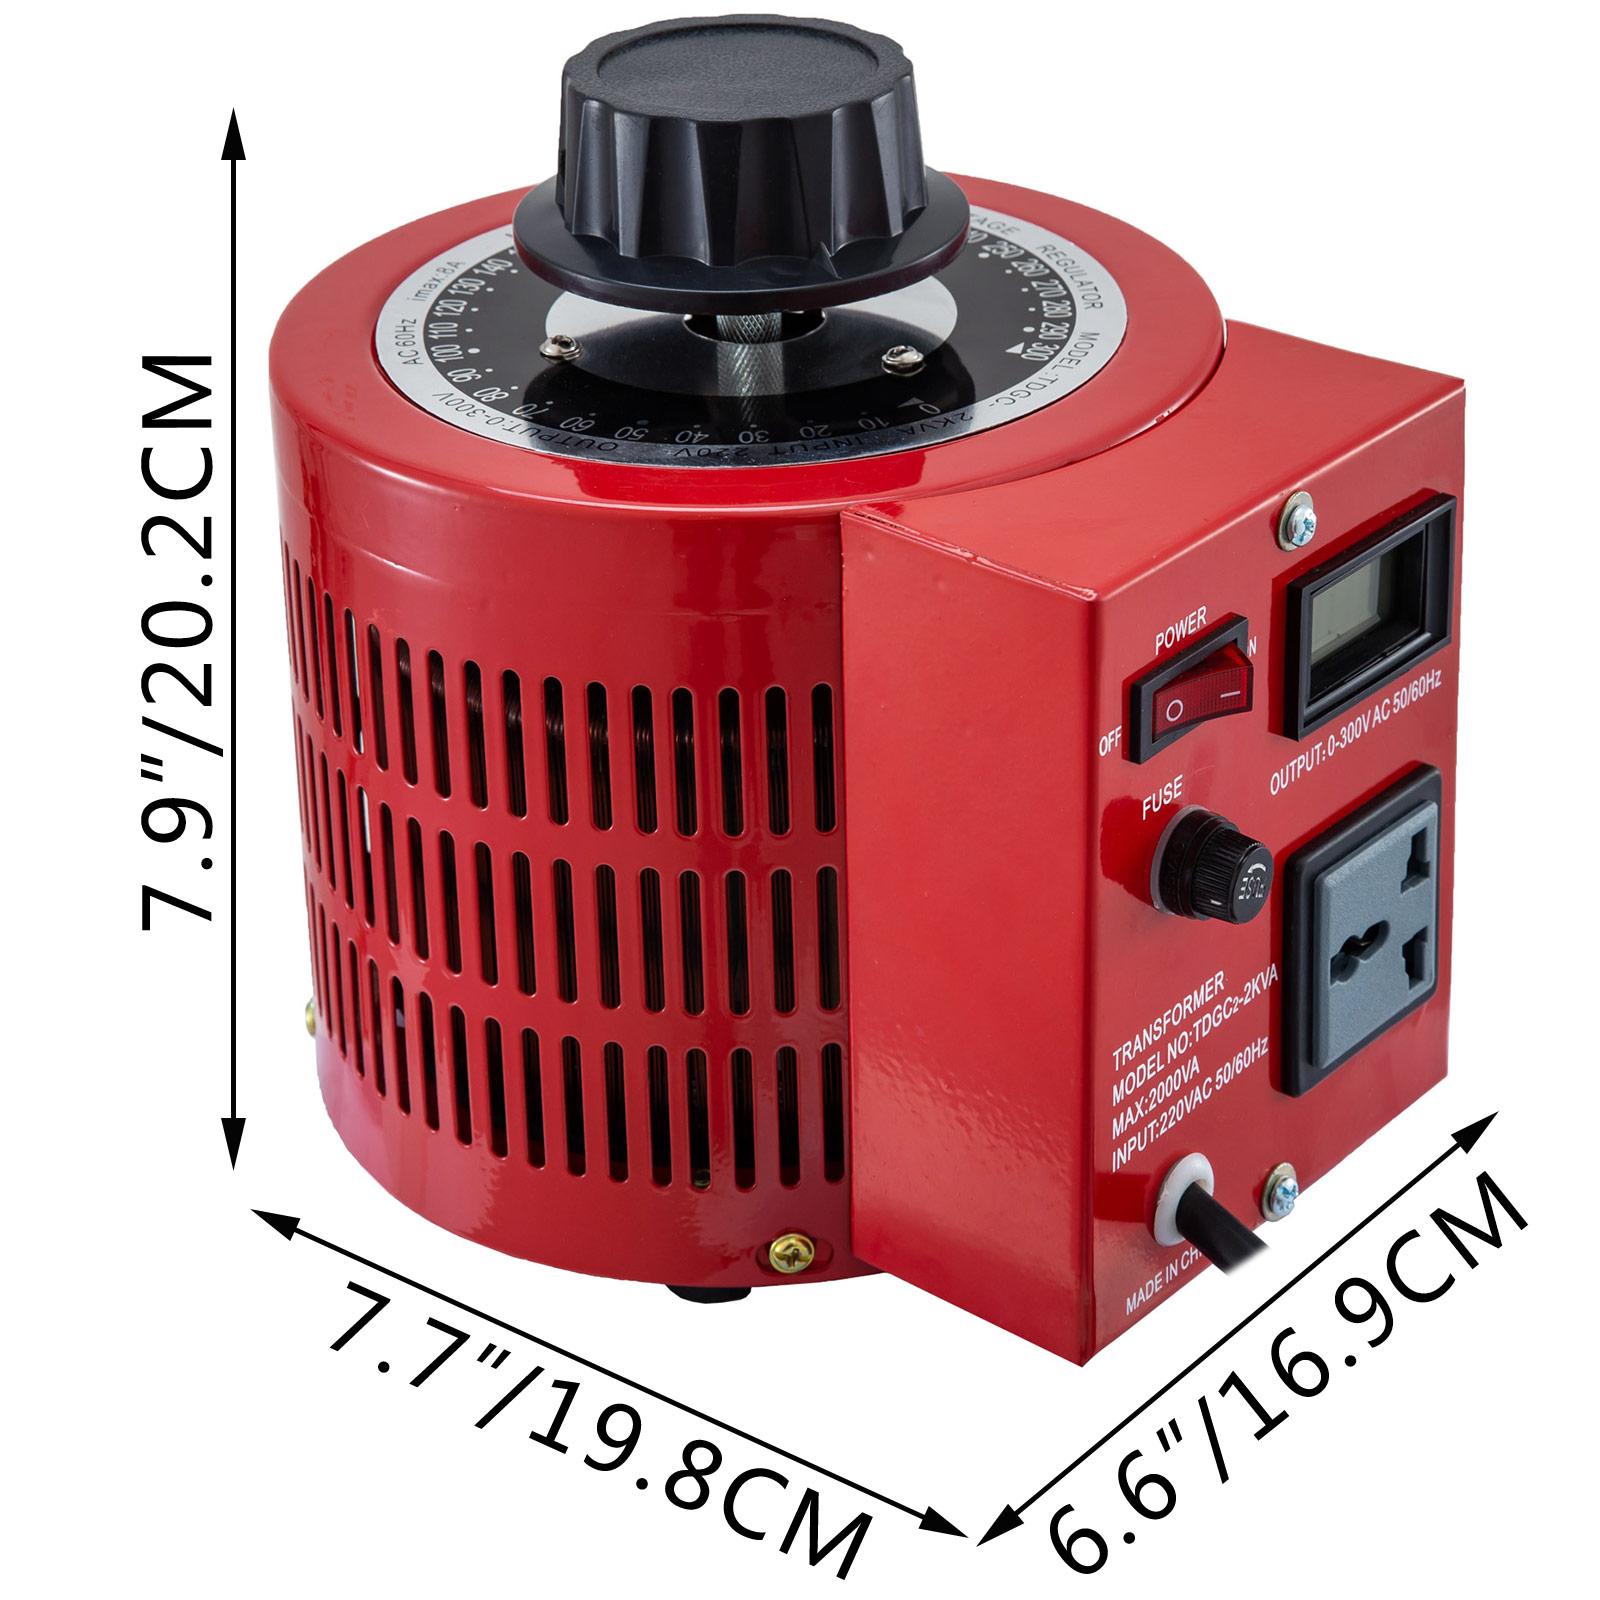 Auto-Variac-Variable-Transformer-0-5-1-2-3KVA-Regulator-pure-copper-coil-220V thumbnail 56